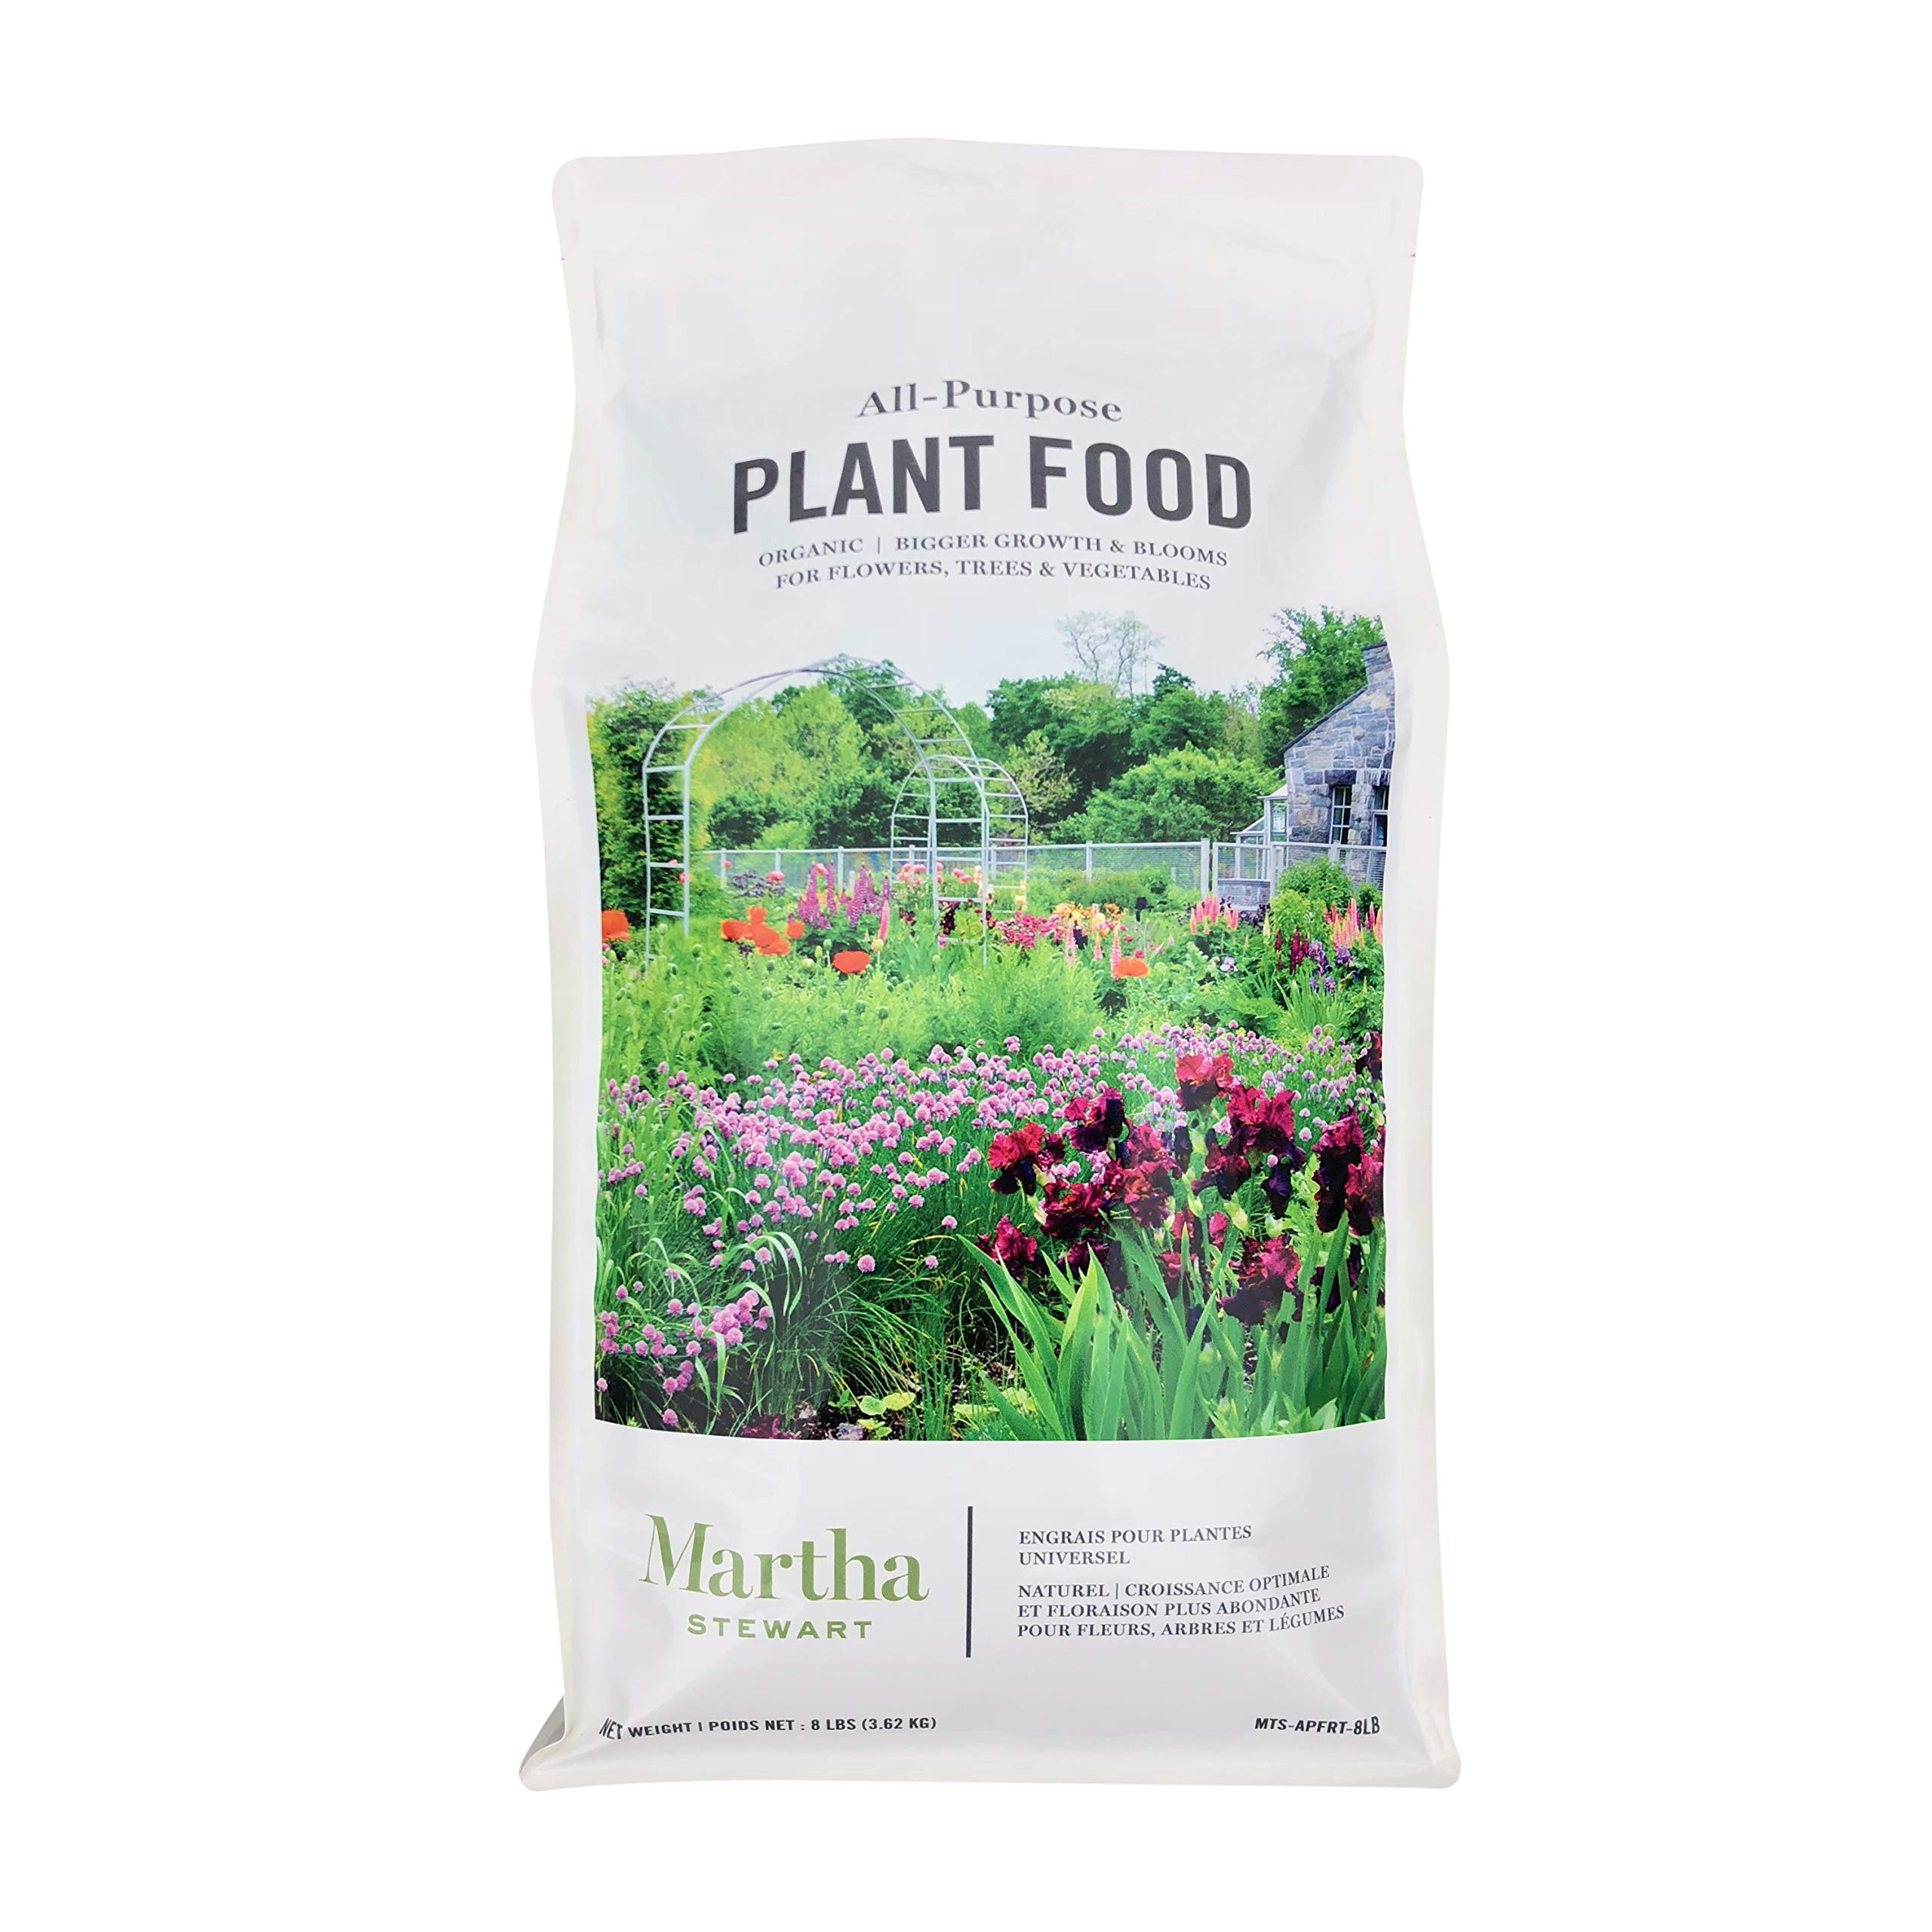 Martha Stewart MTS-APFRT-8LB All Purpose Plant Food for Flowers, Shrubs, & Vegetables,Brown